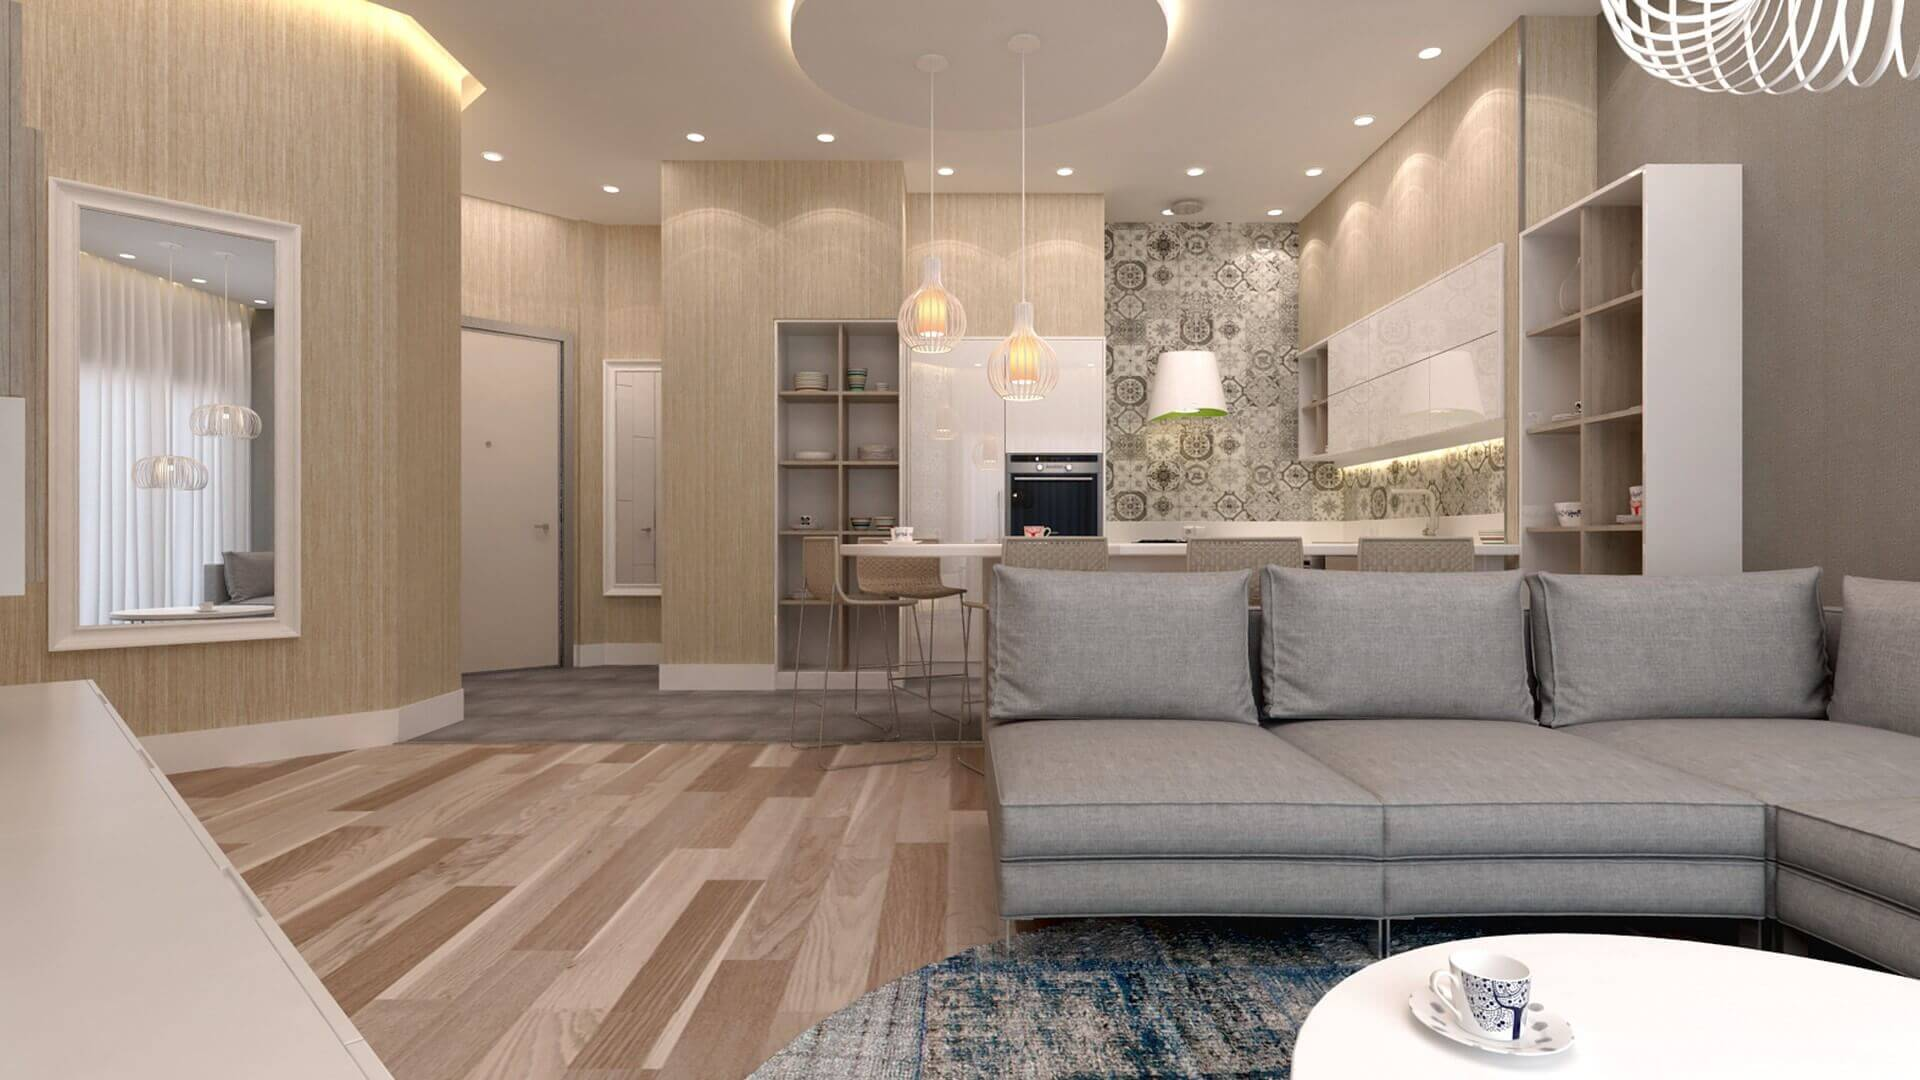 Ankara incomplete house 3191 D. Aslan Flat Residential